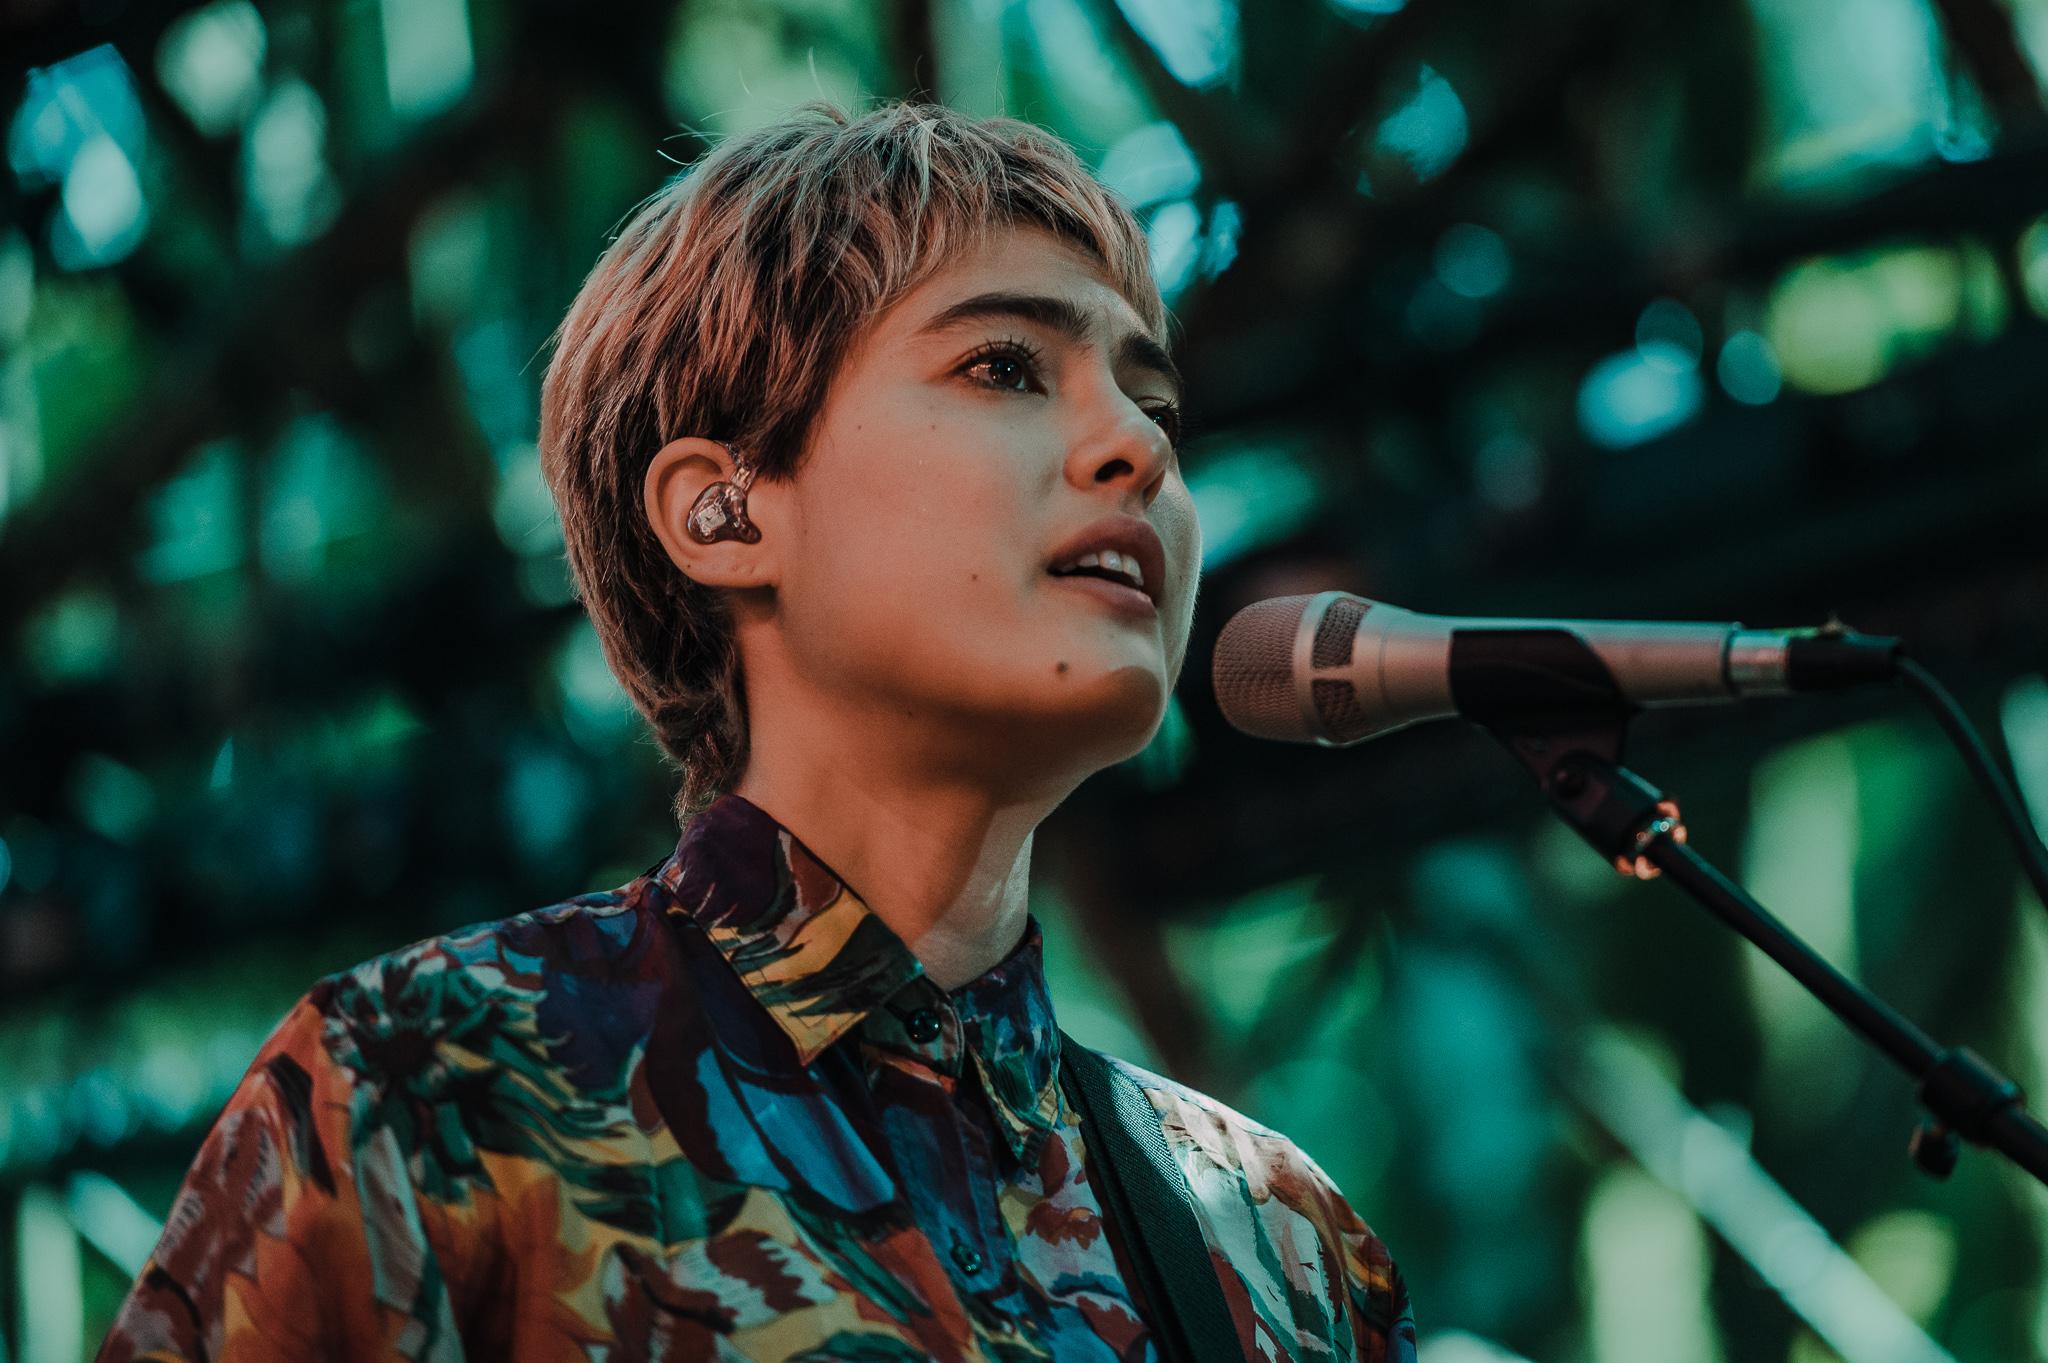 Miya Folick; at the Woods Stage